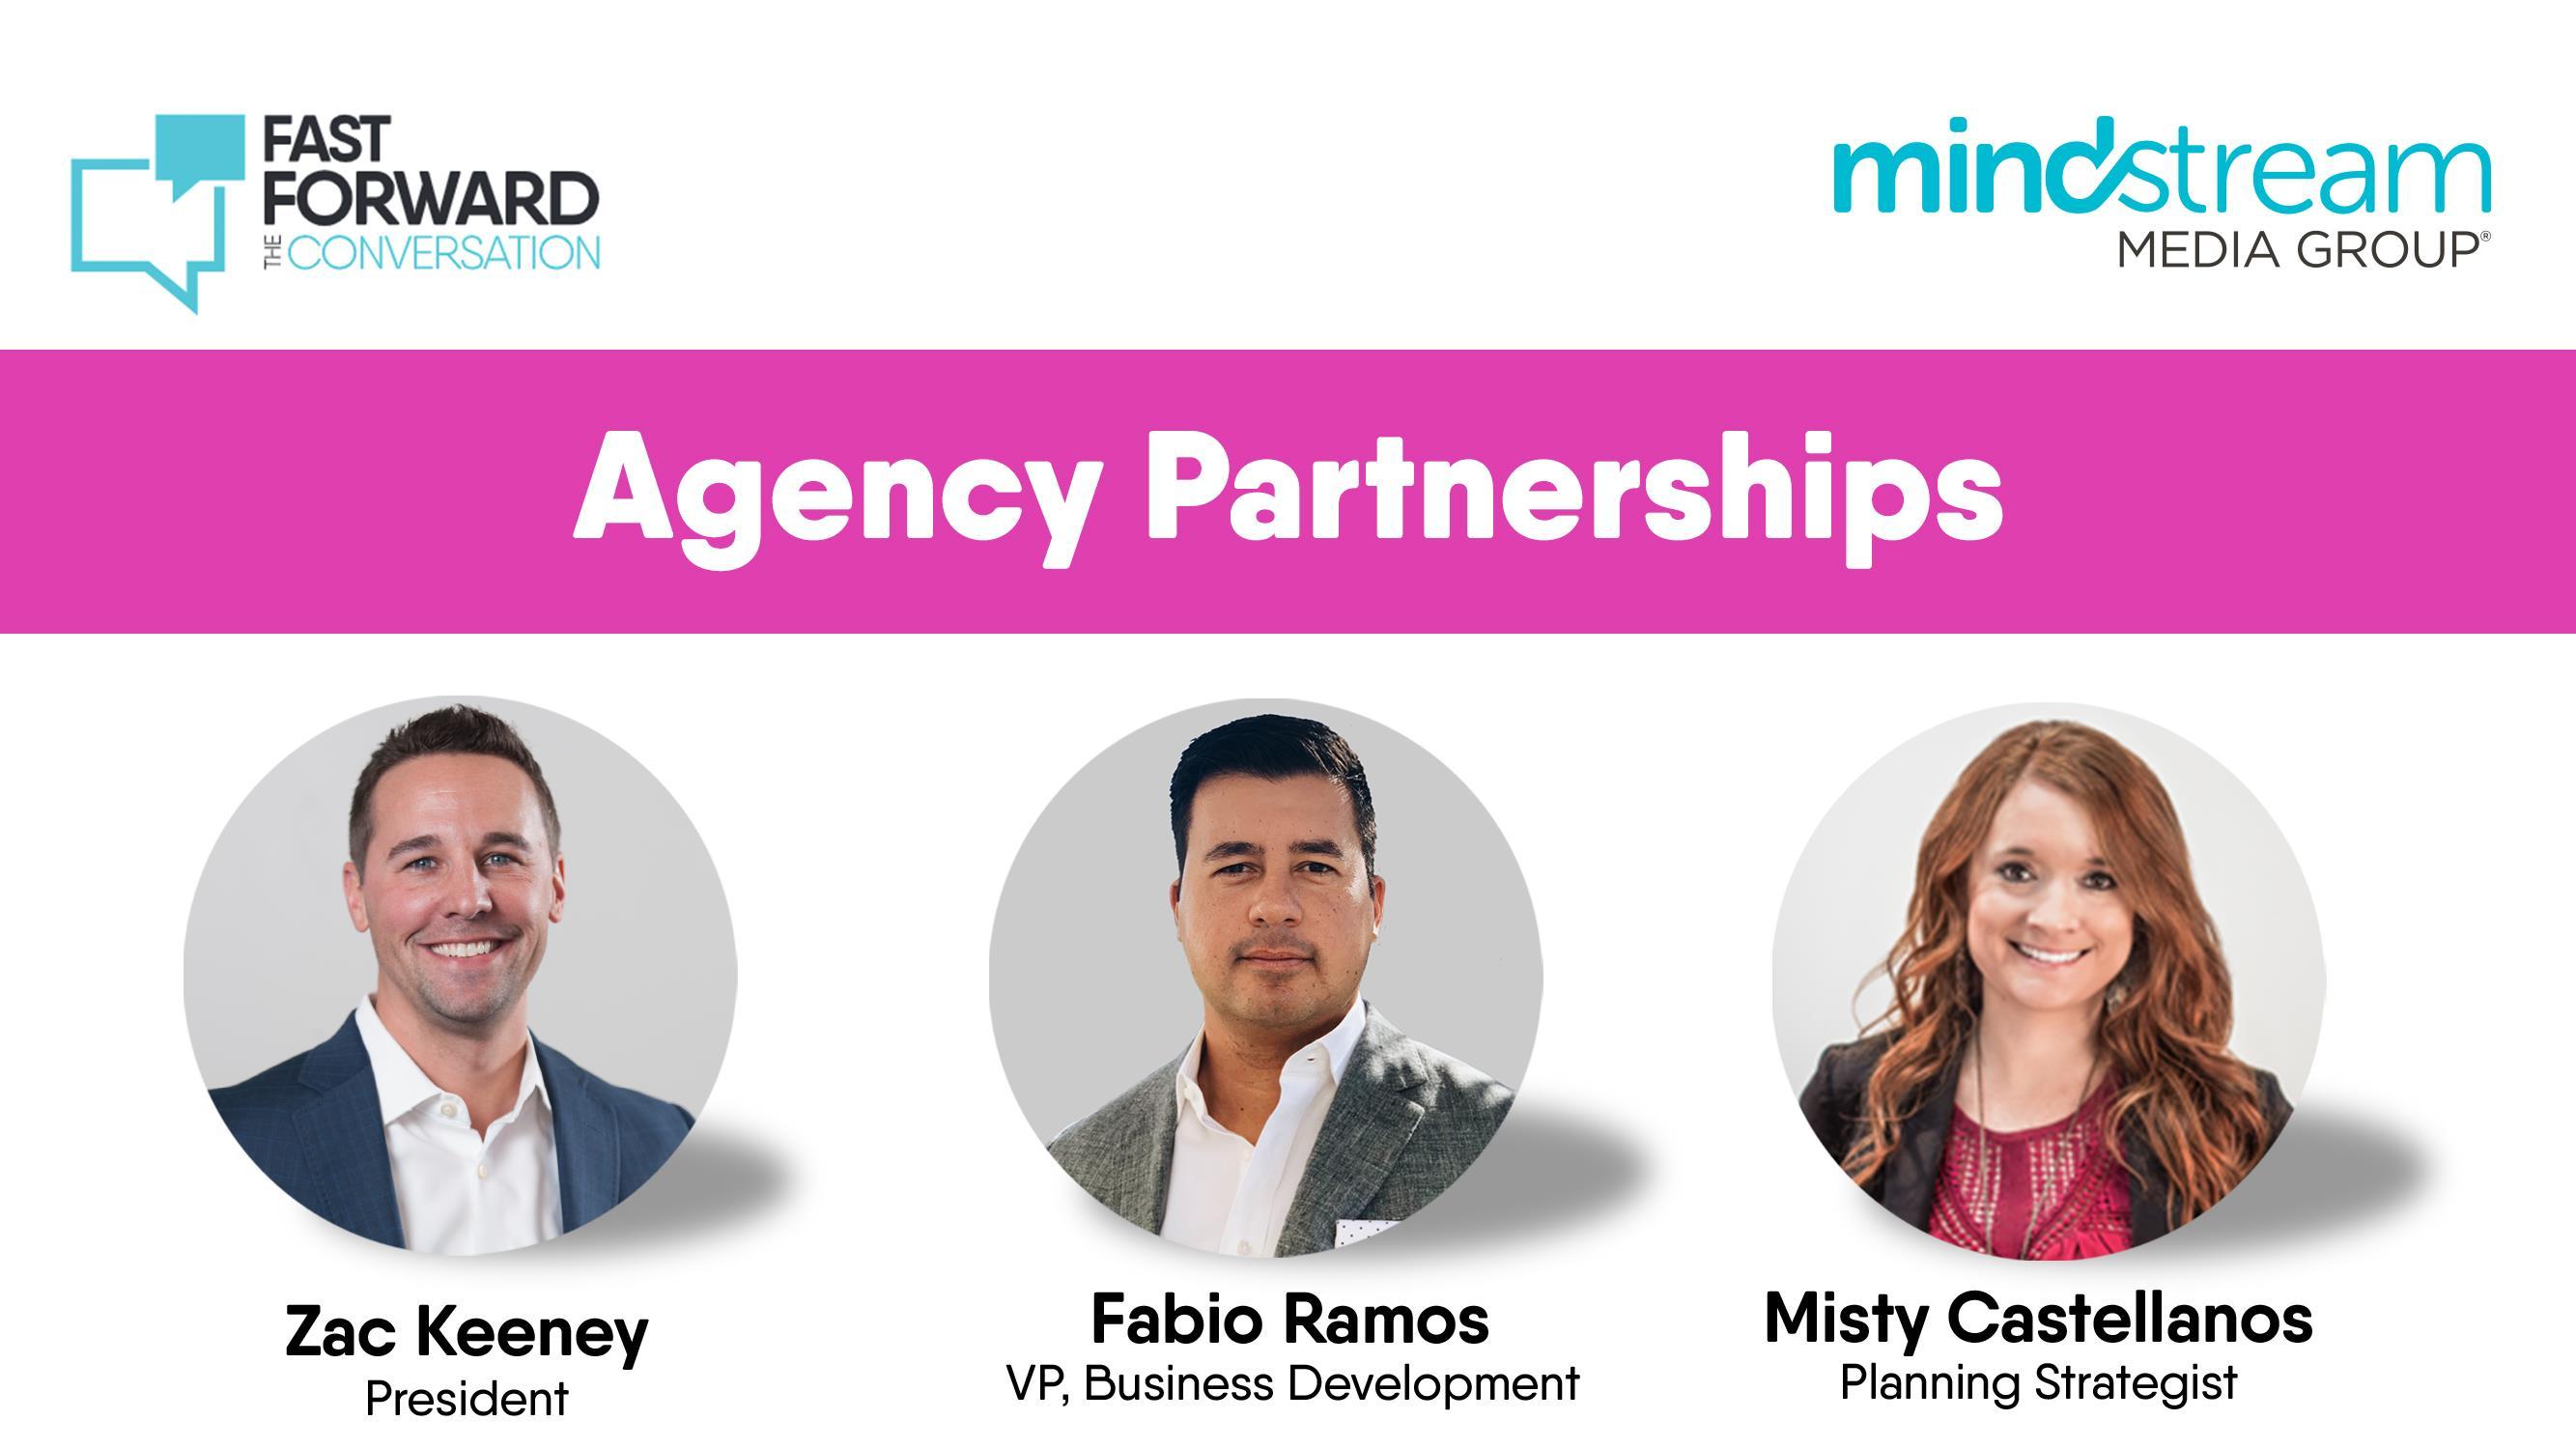 Providing Media Leverage to Agency Partners